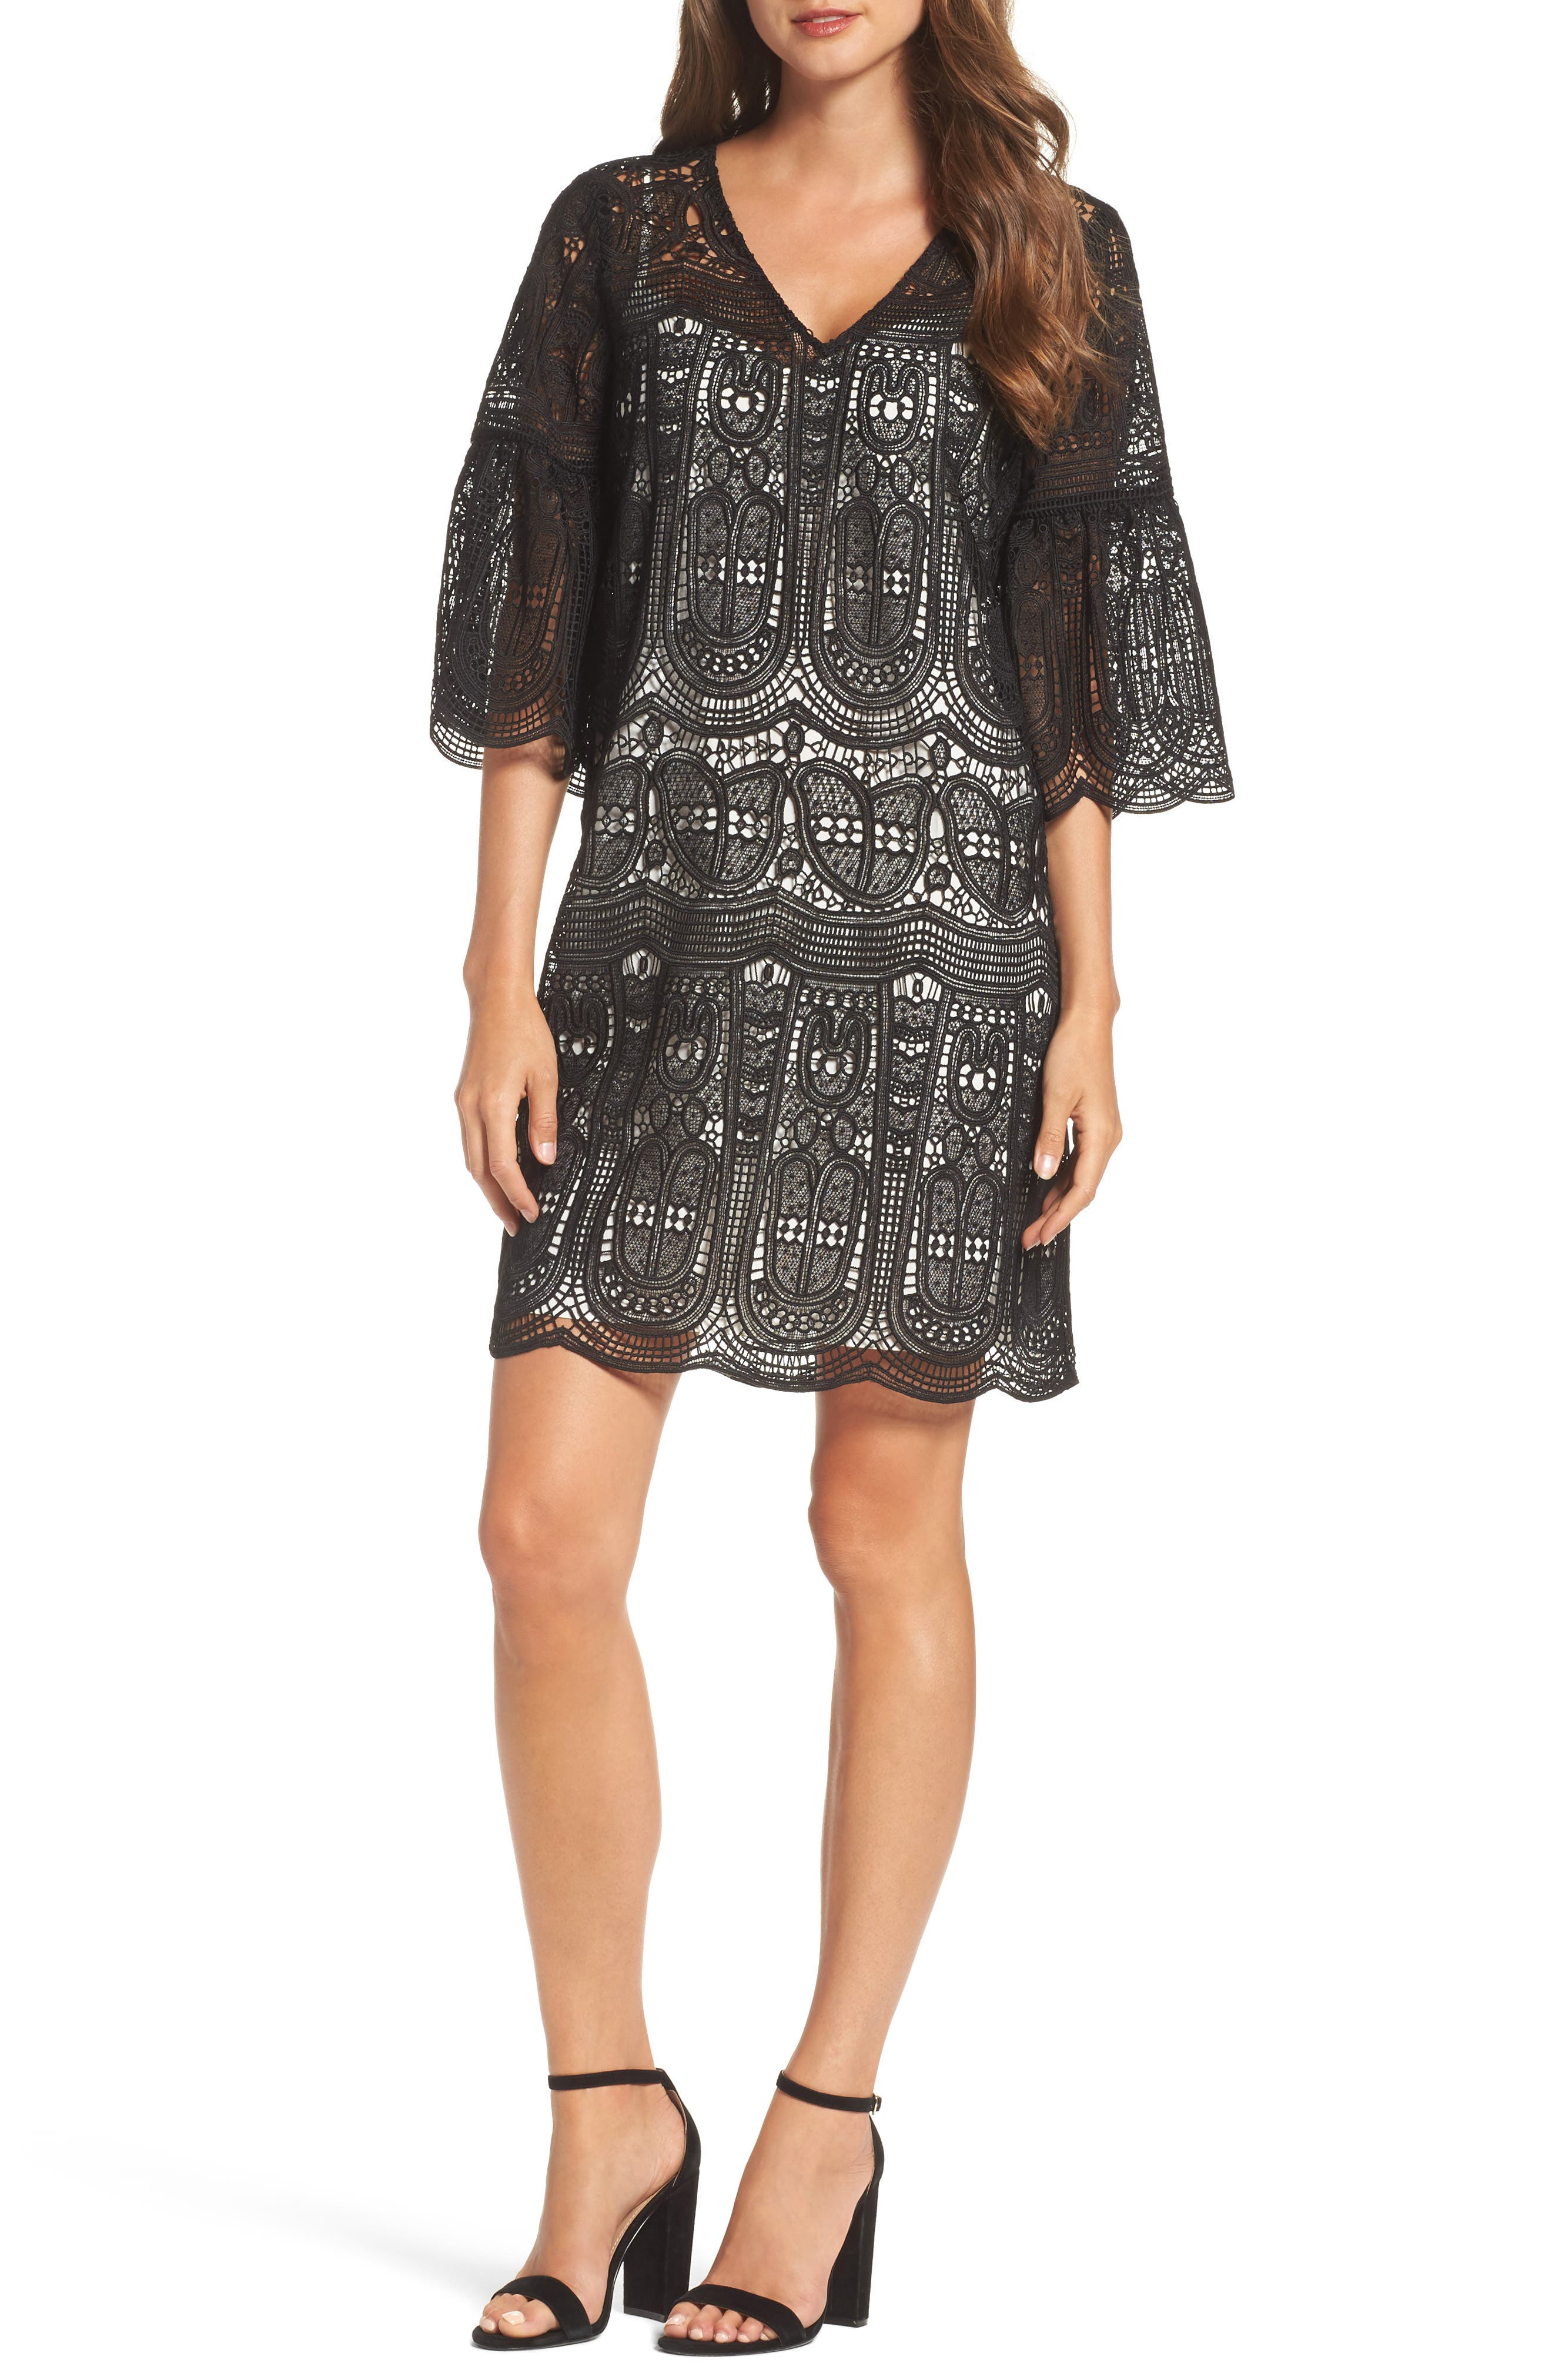 Alternate Image 1 Selected - Kobi Halperin Gaia Lace Shift Dress (Nordstrom Exclusive)